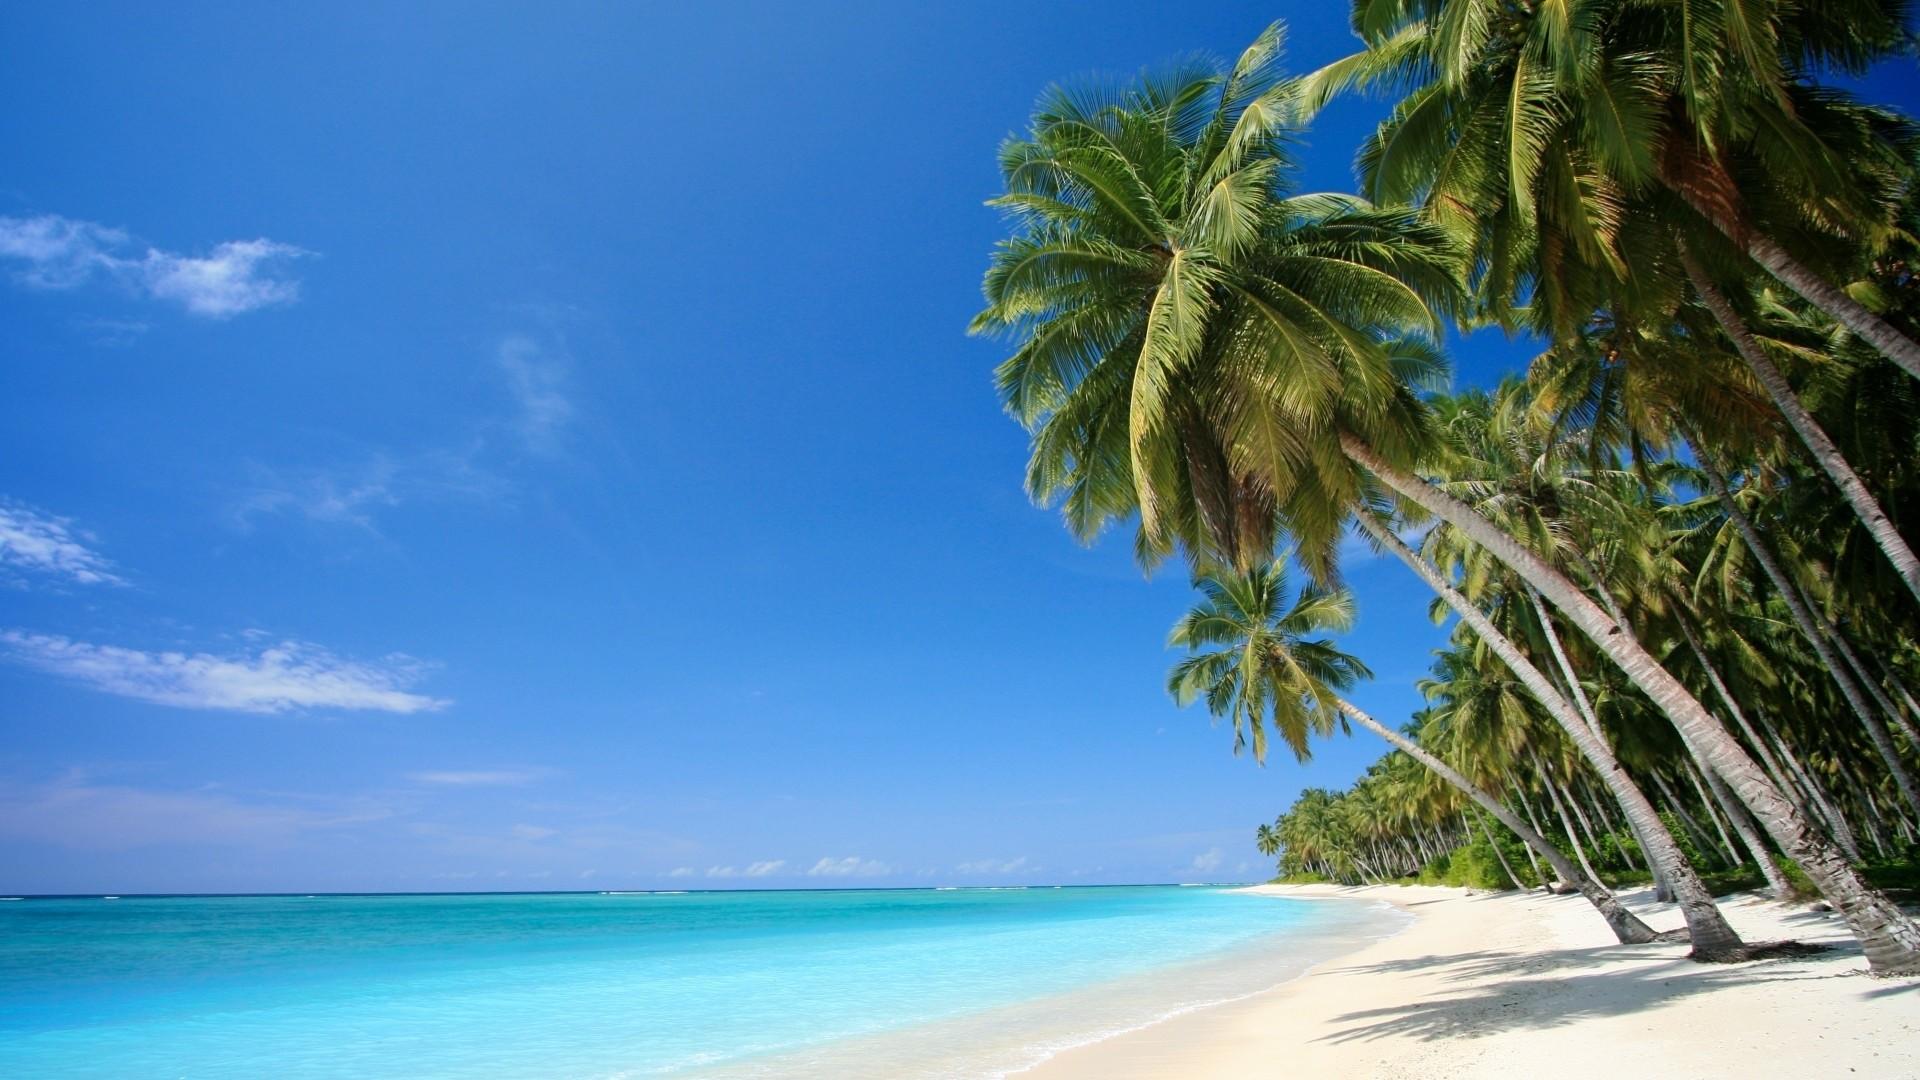 Tropical Beach Scenes Wallpaper (49+ images)